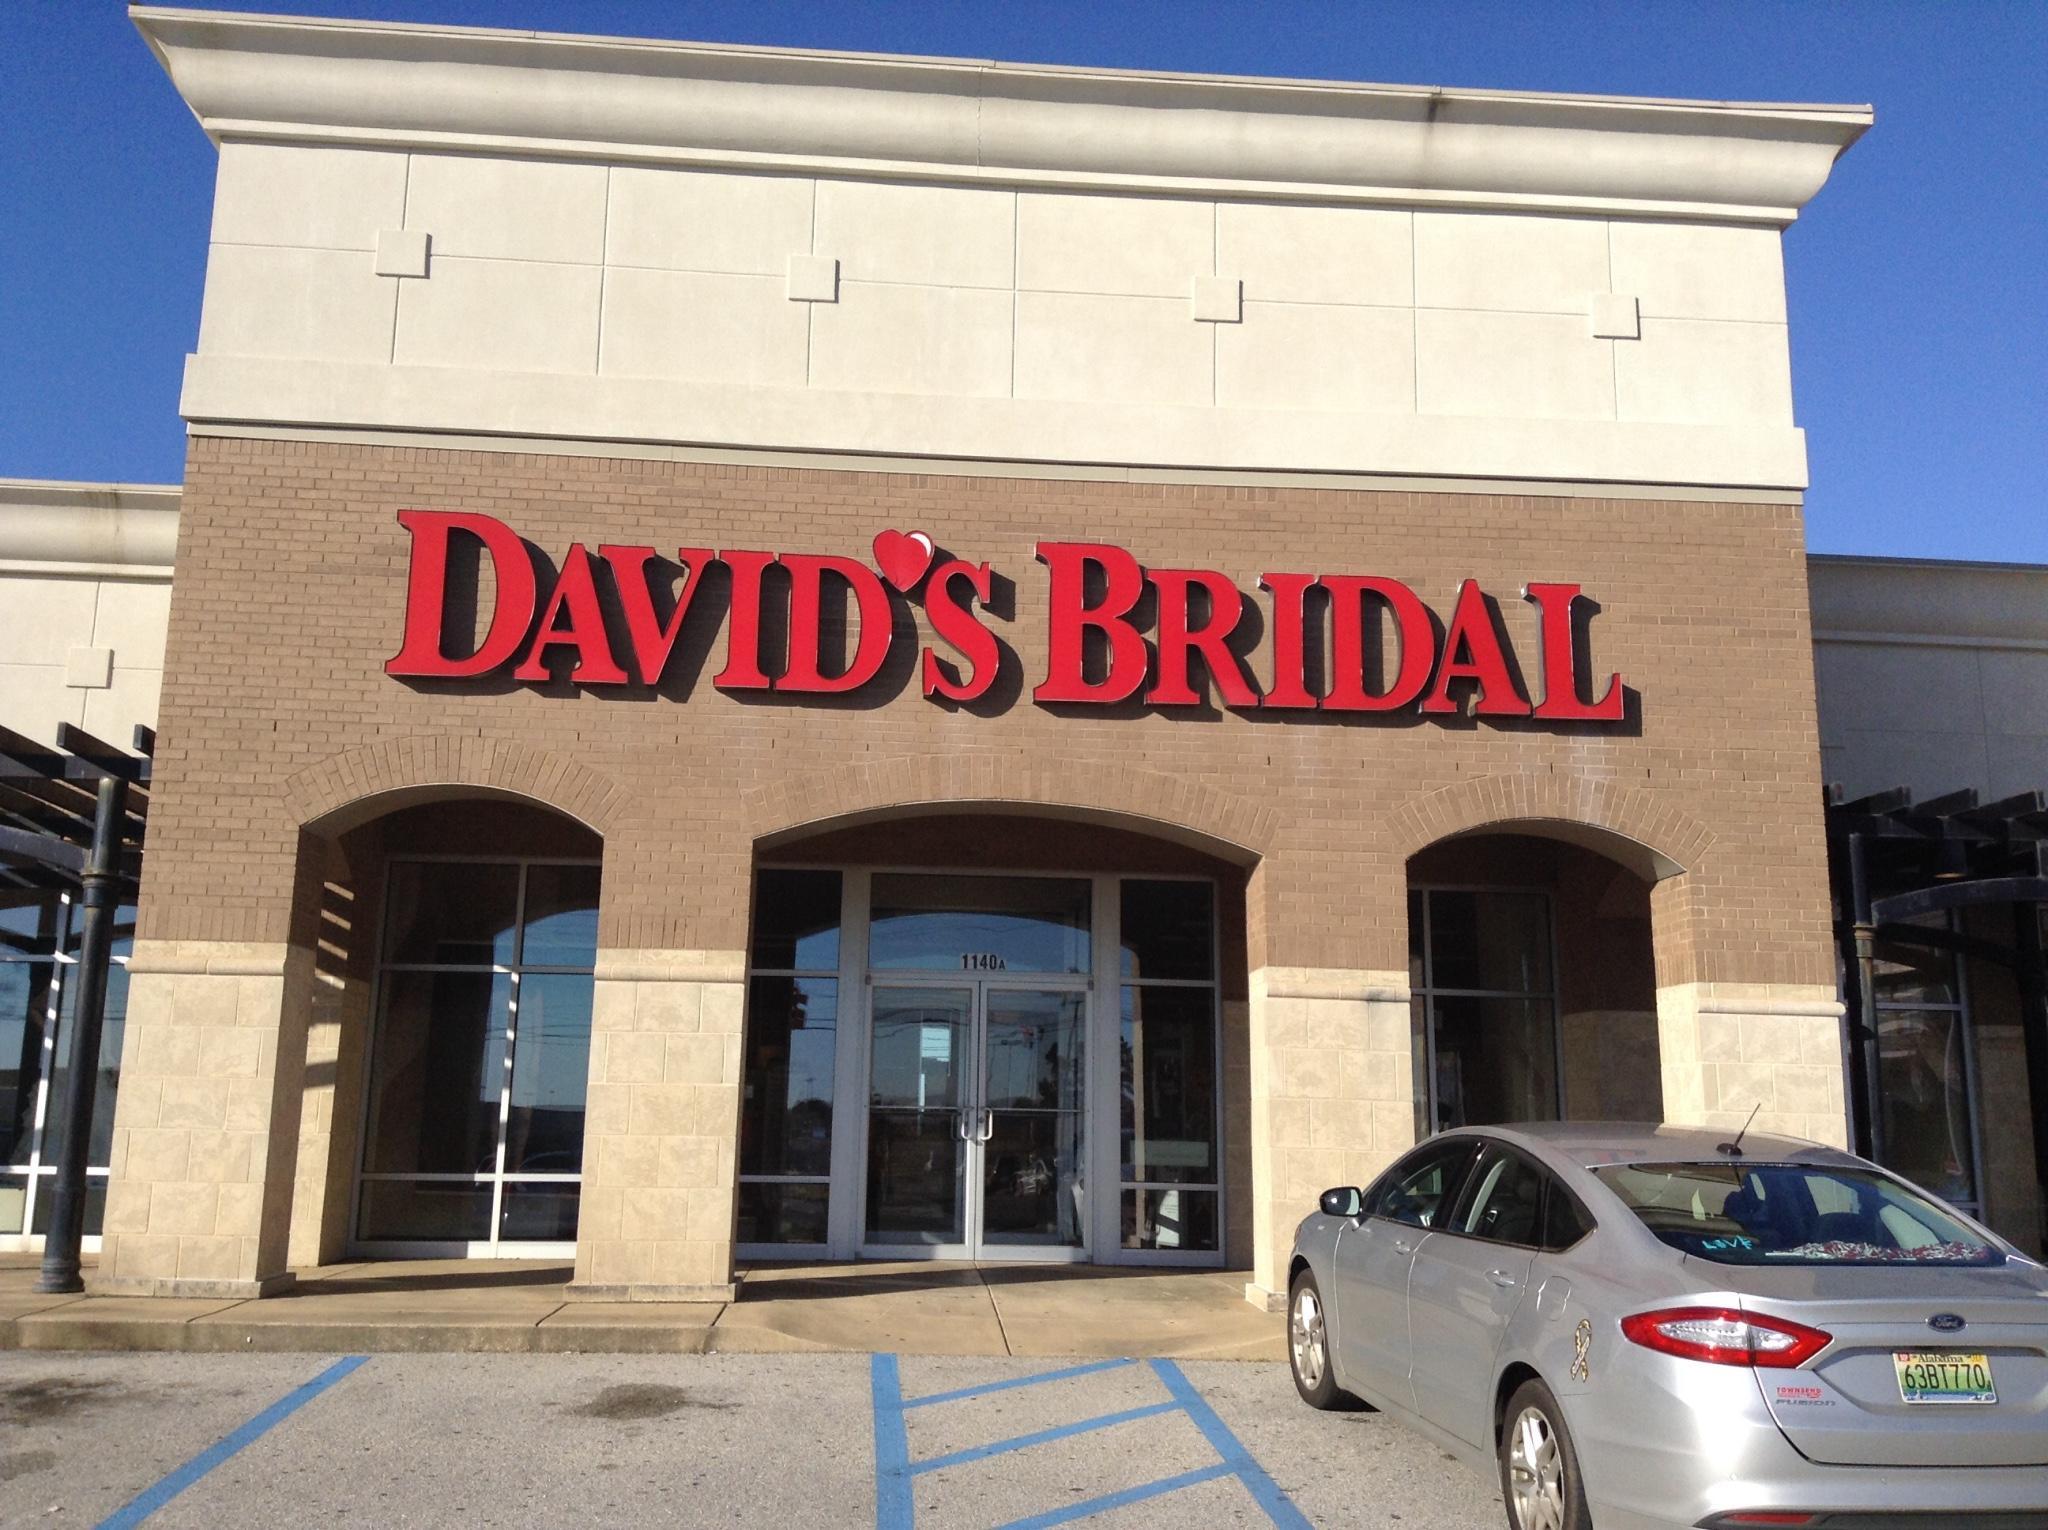 David's Bridal - CLOSED image 3